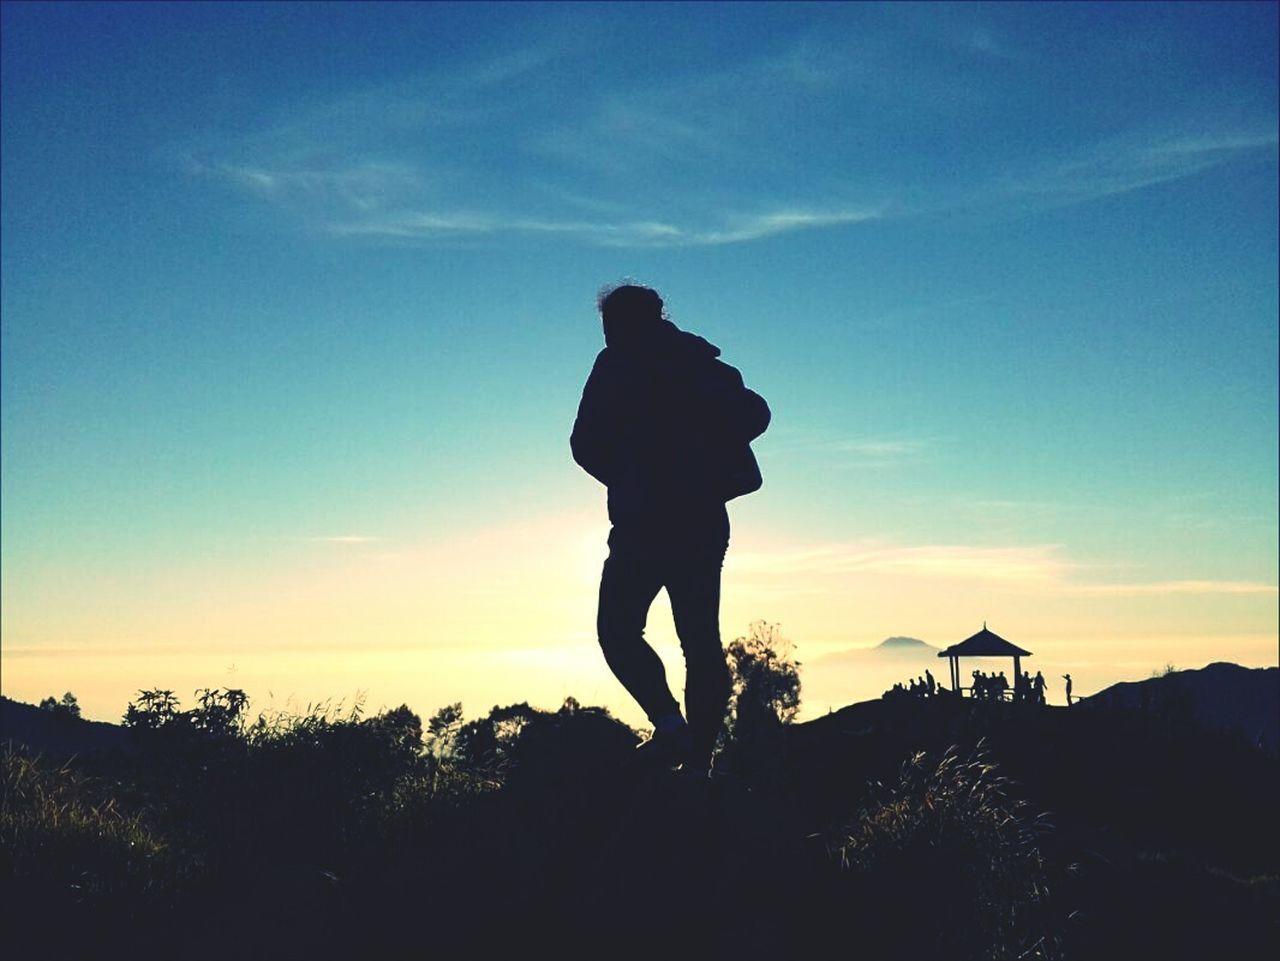 Sunrise Hiking Outdoors Mountain SikunirDiengWonosobo Wonderfulindonesia Beauty In Nature Strongwoman Siluet